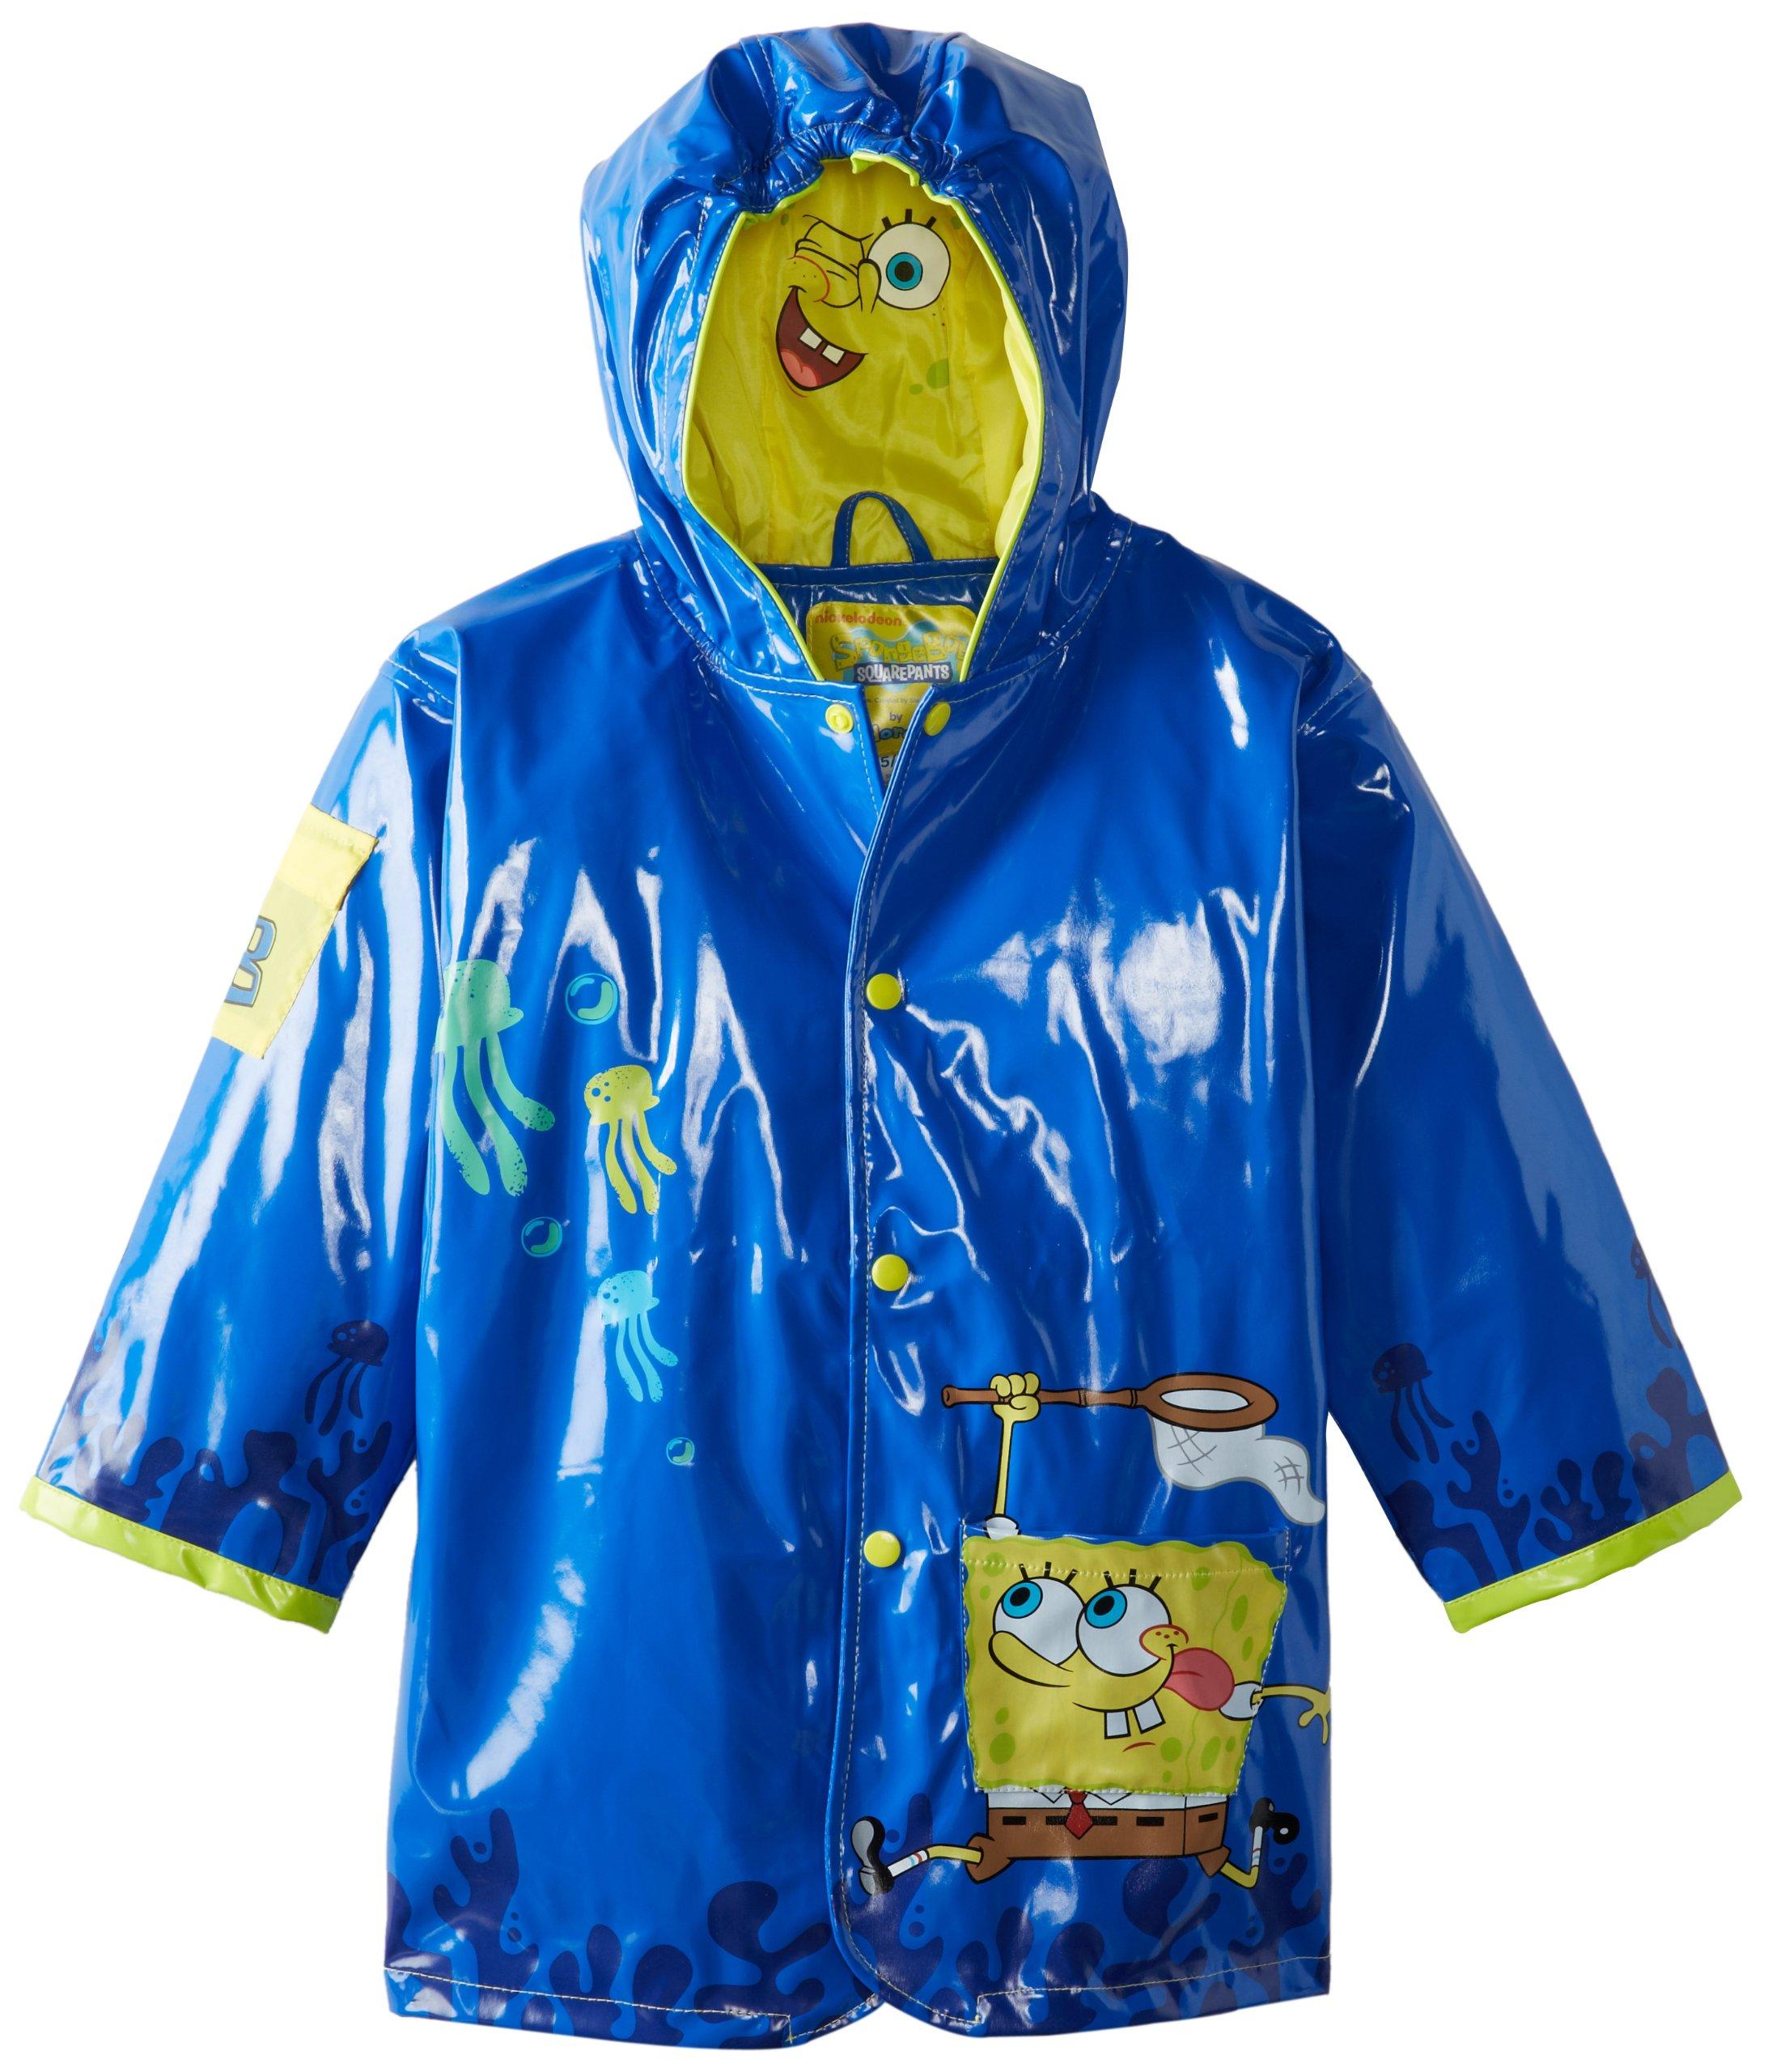 Nickelodeon Little Boys' SpongeBob Rain Coat, Blue, Size 5/6